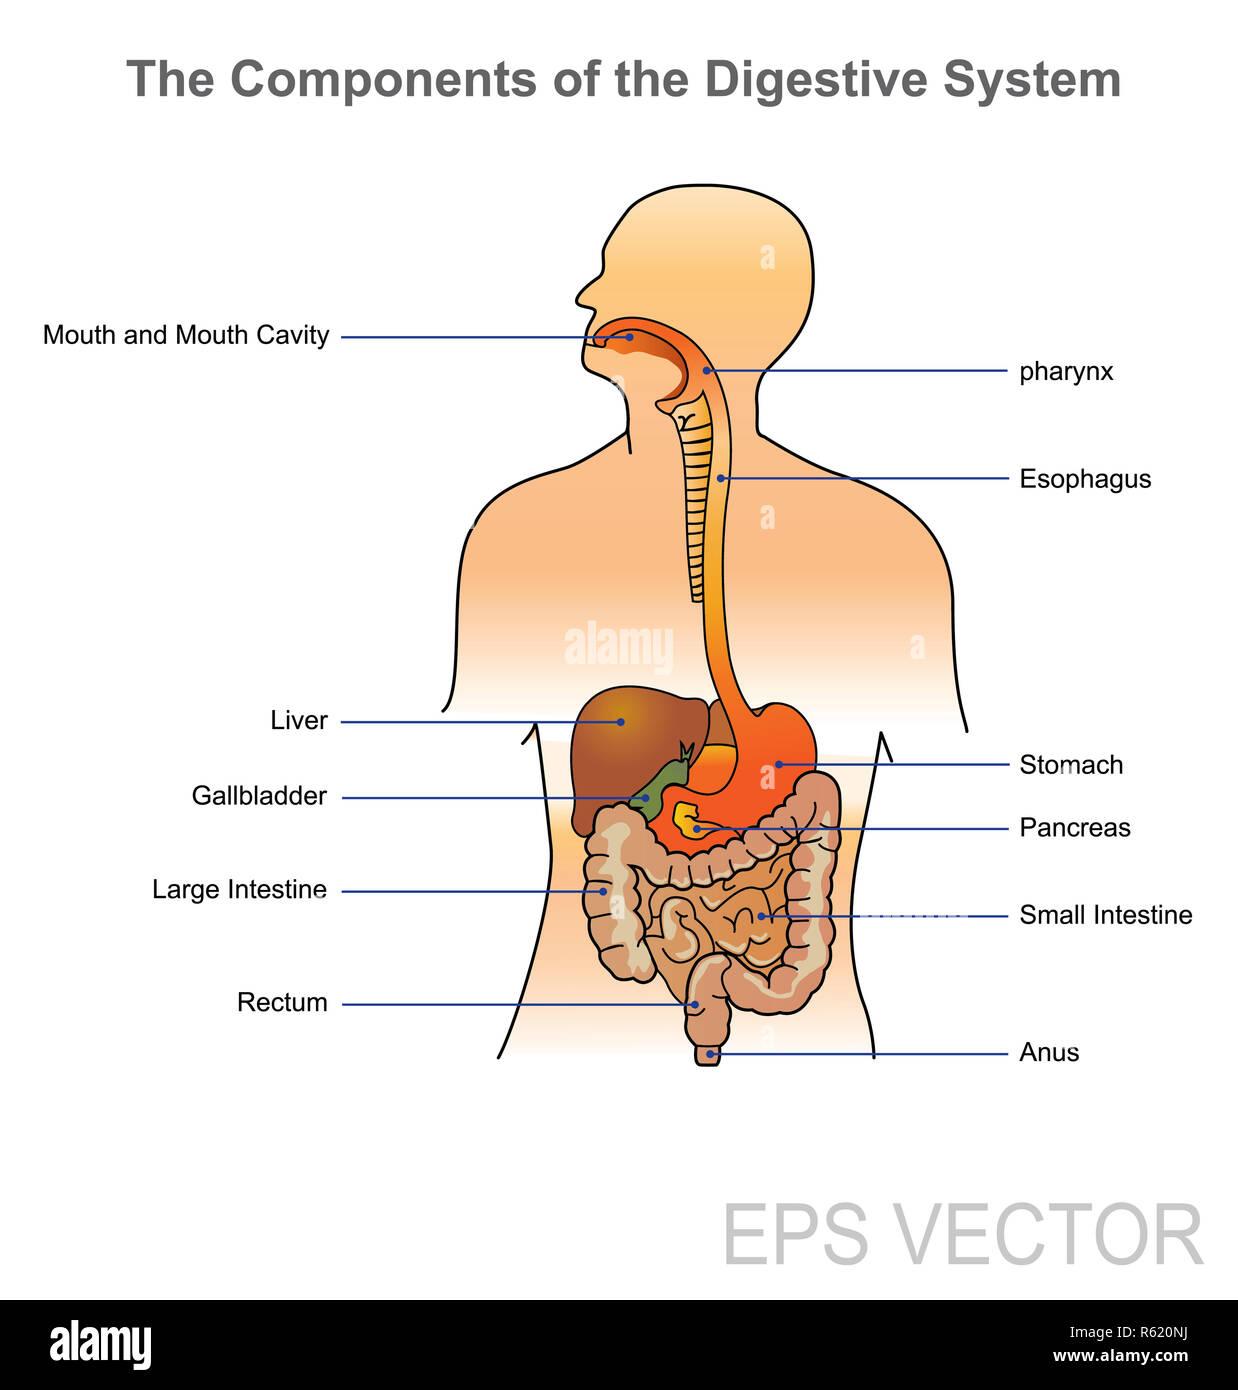 The Human Digestive System Illustration Anatomy Body Stock Photo